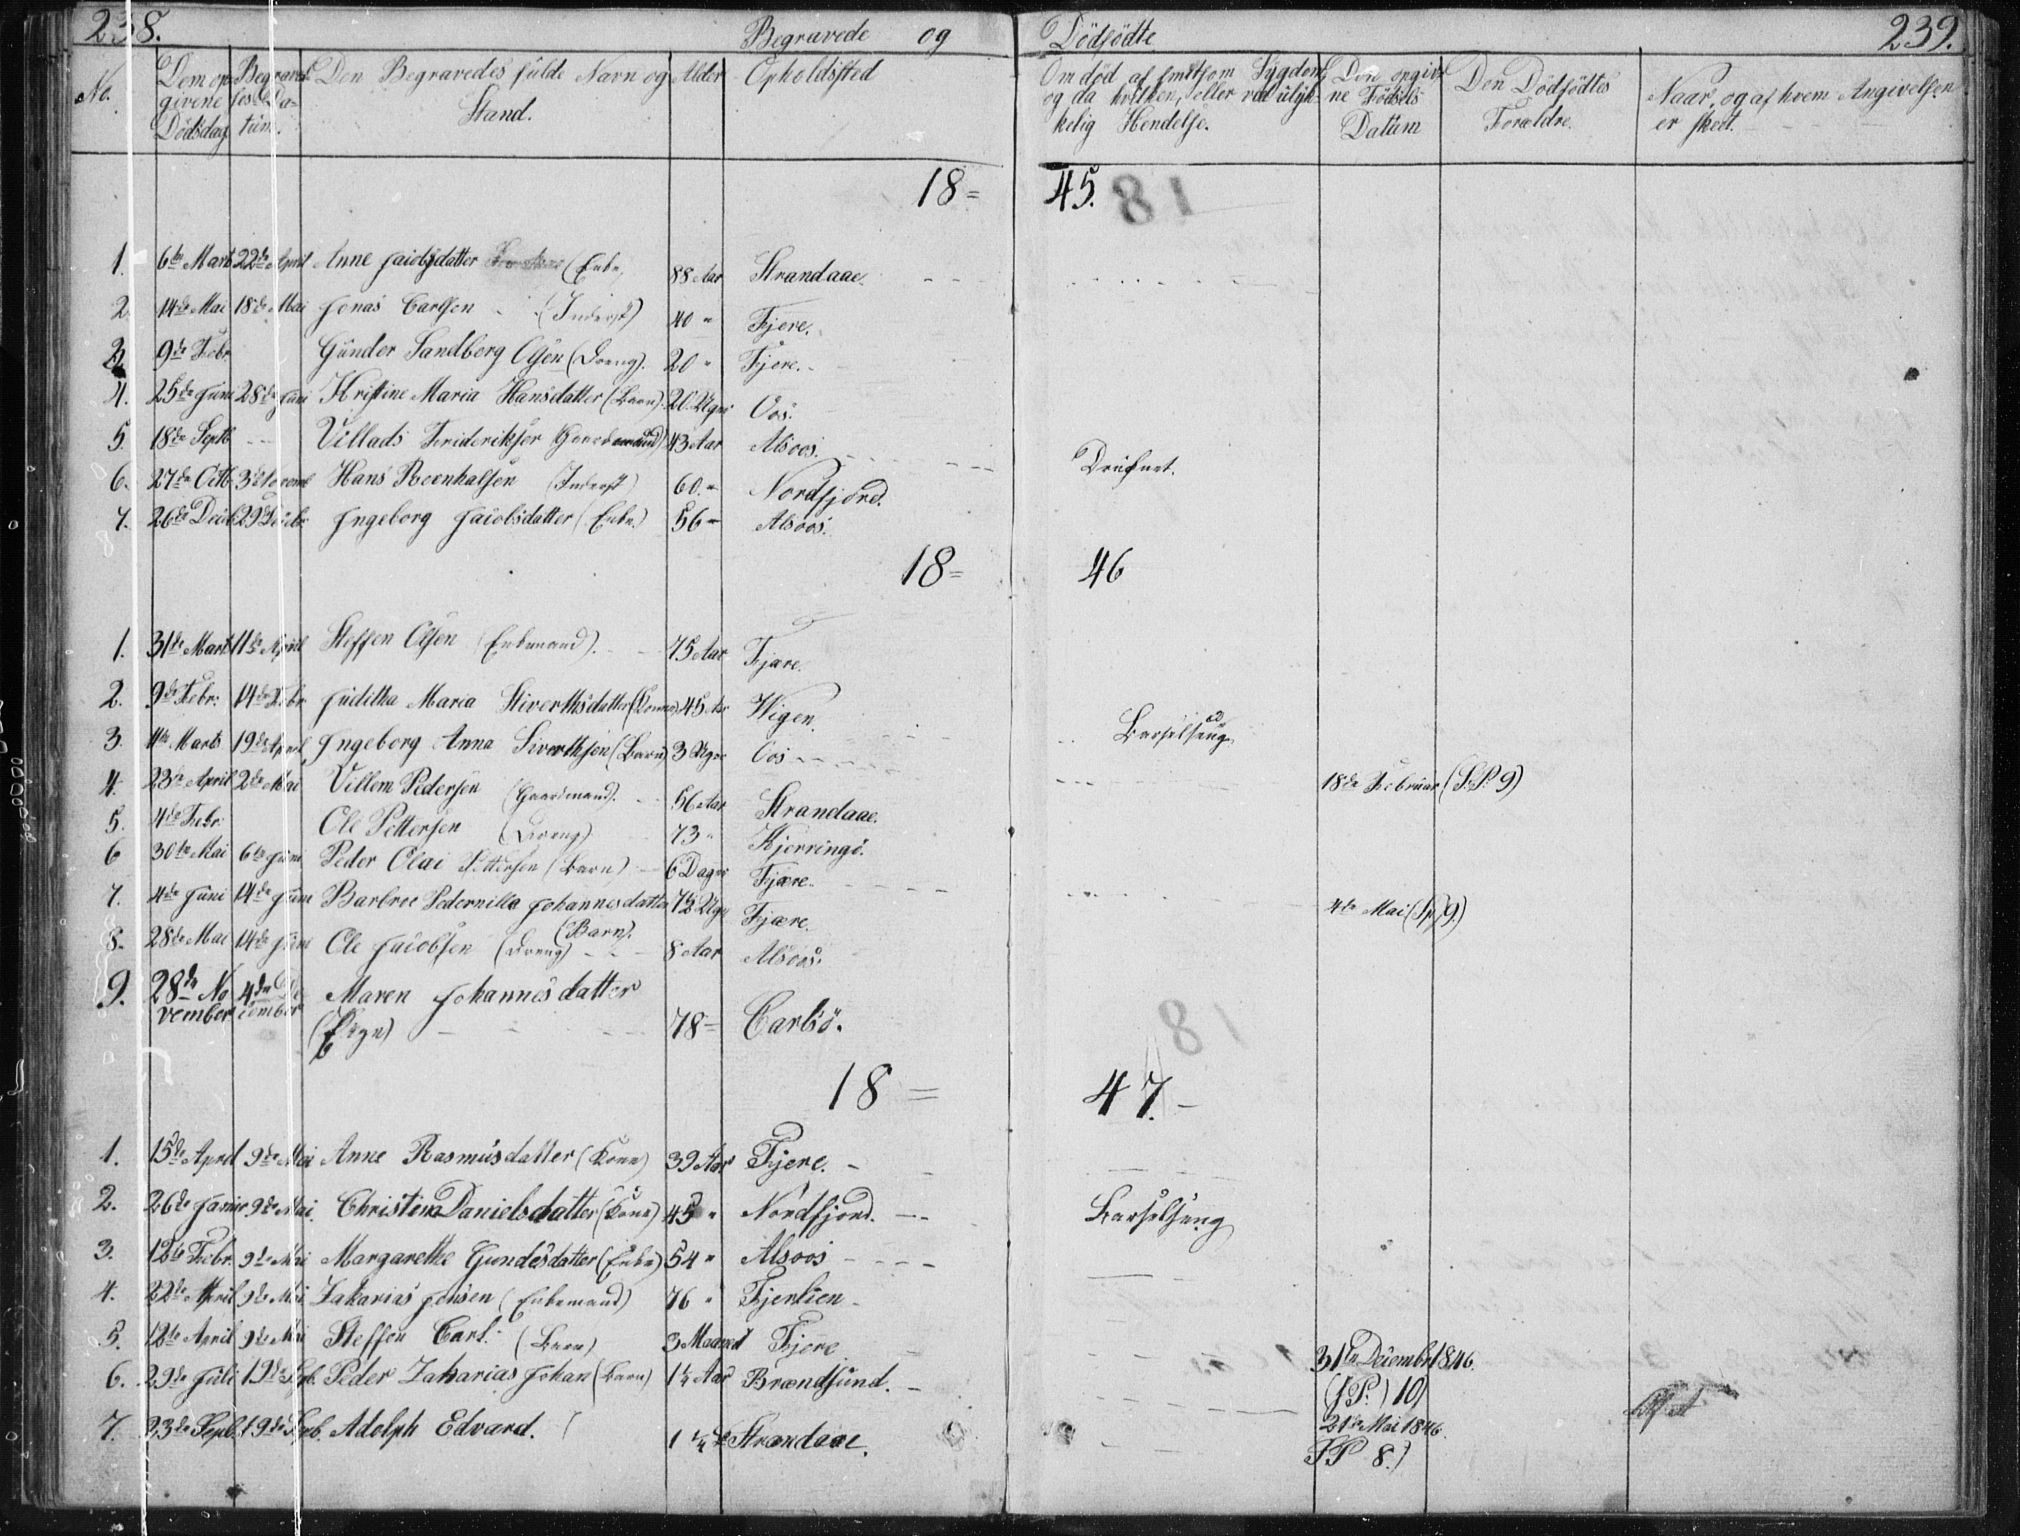 SAT, Ministerialprotokoller, klokkerbøker og fødselsregistre - Nordland, 803/L0074: Klokkerbok nr. 803C01, 1845-1866, s. 238-239